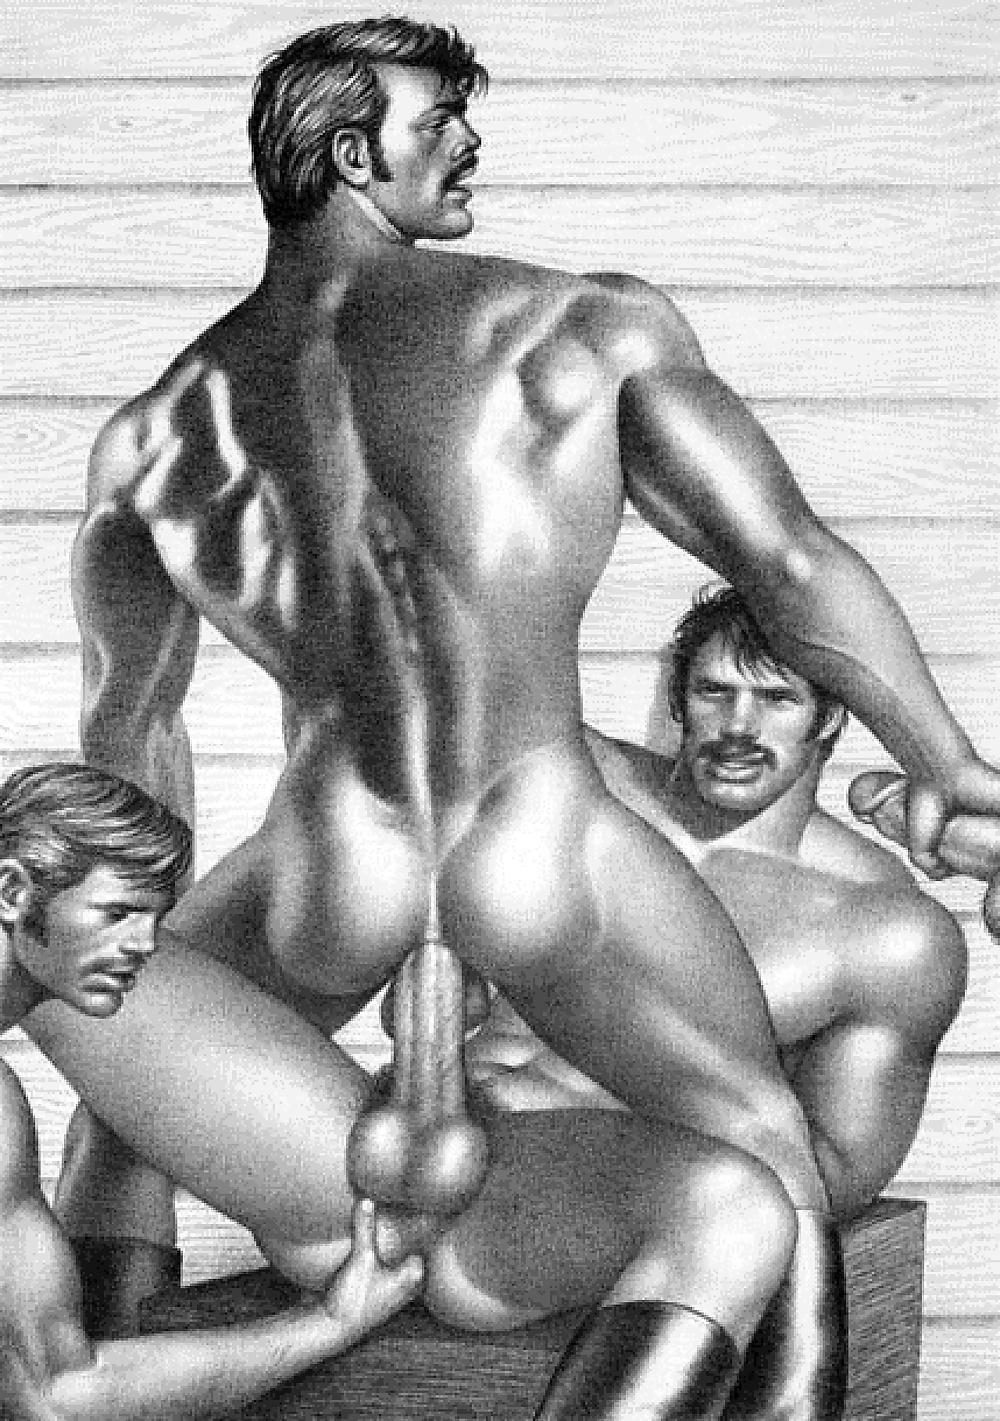 Finnish male models nude